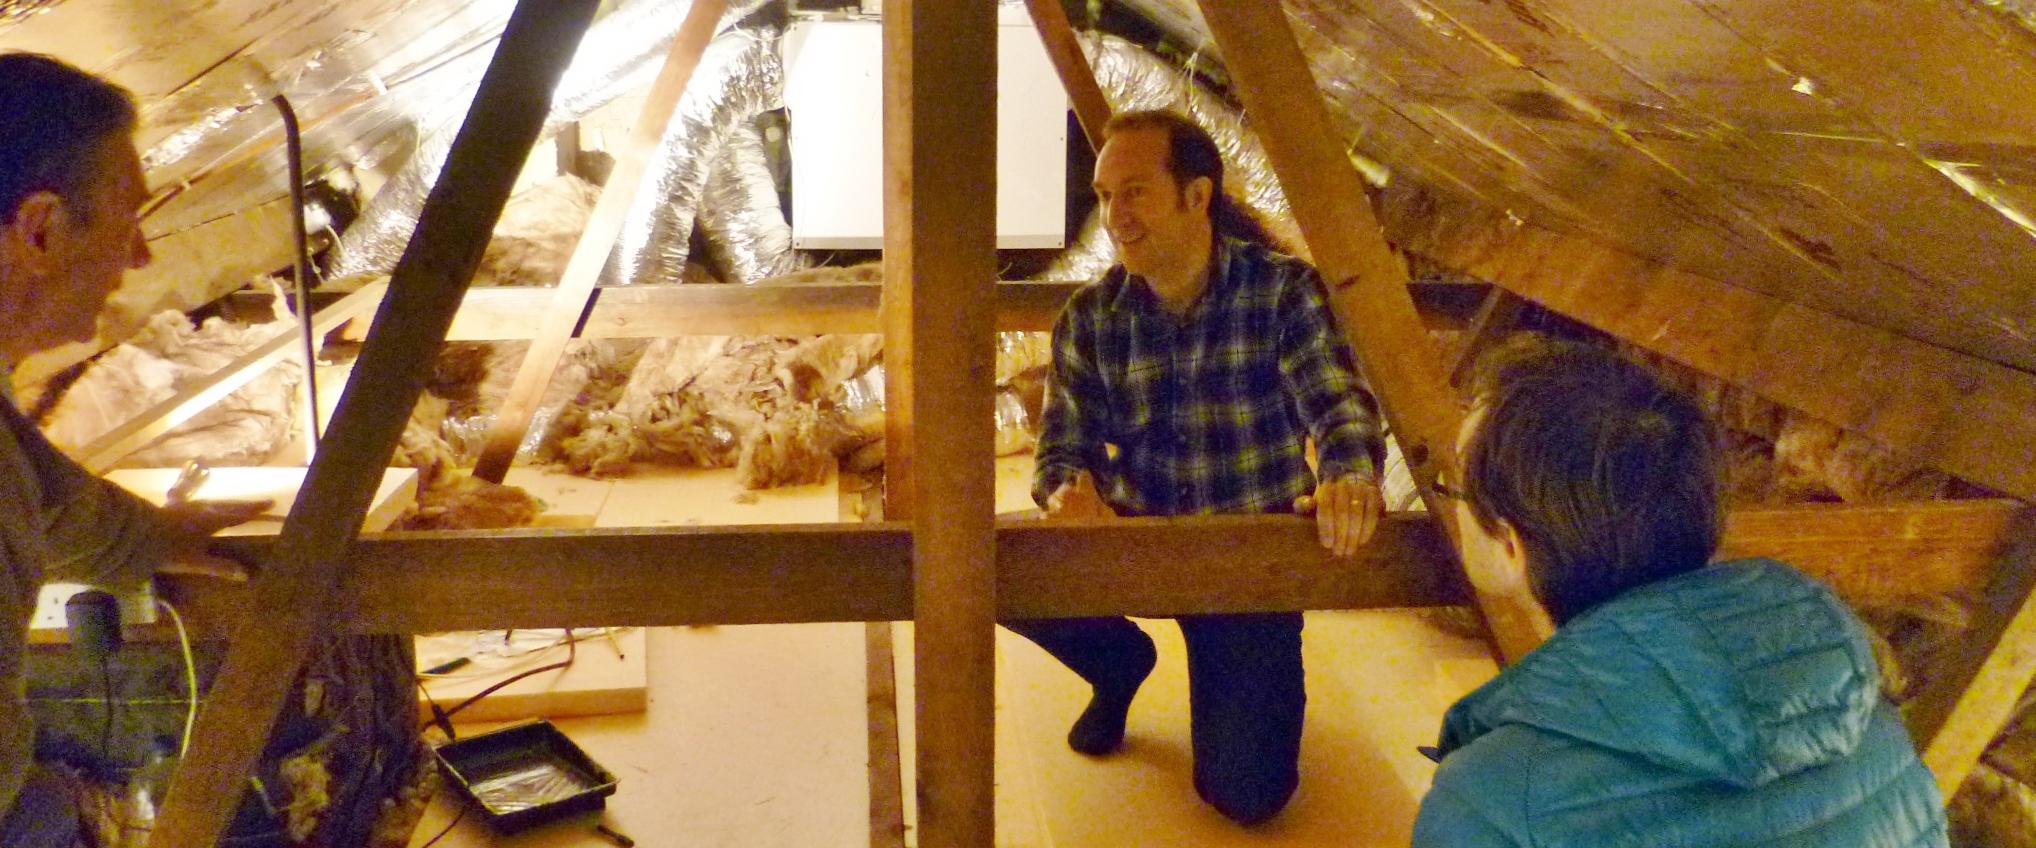 Loft insulation and boarding